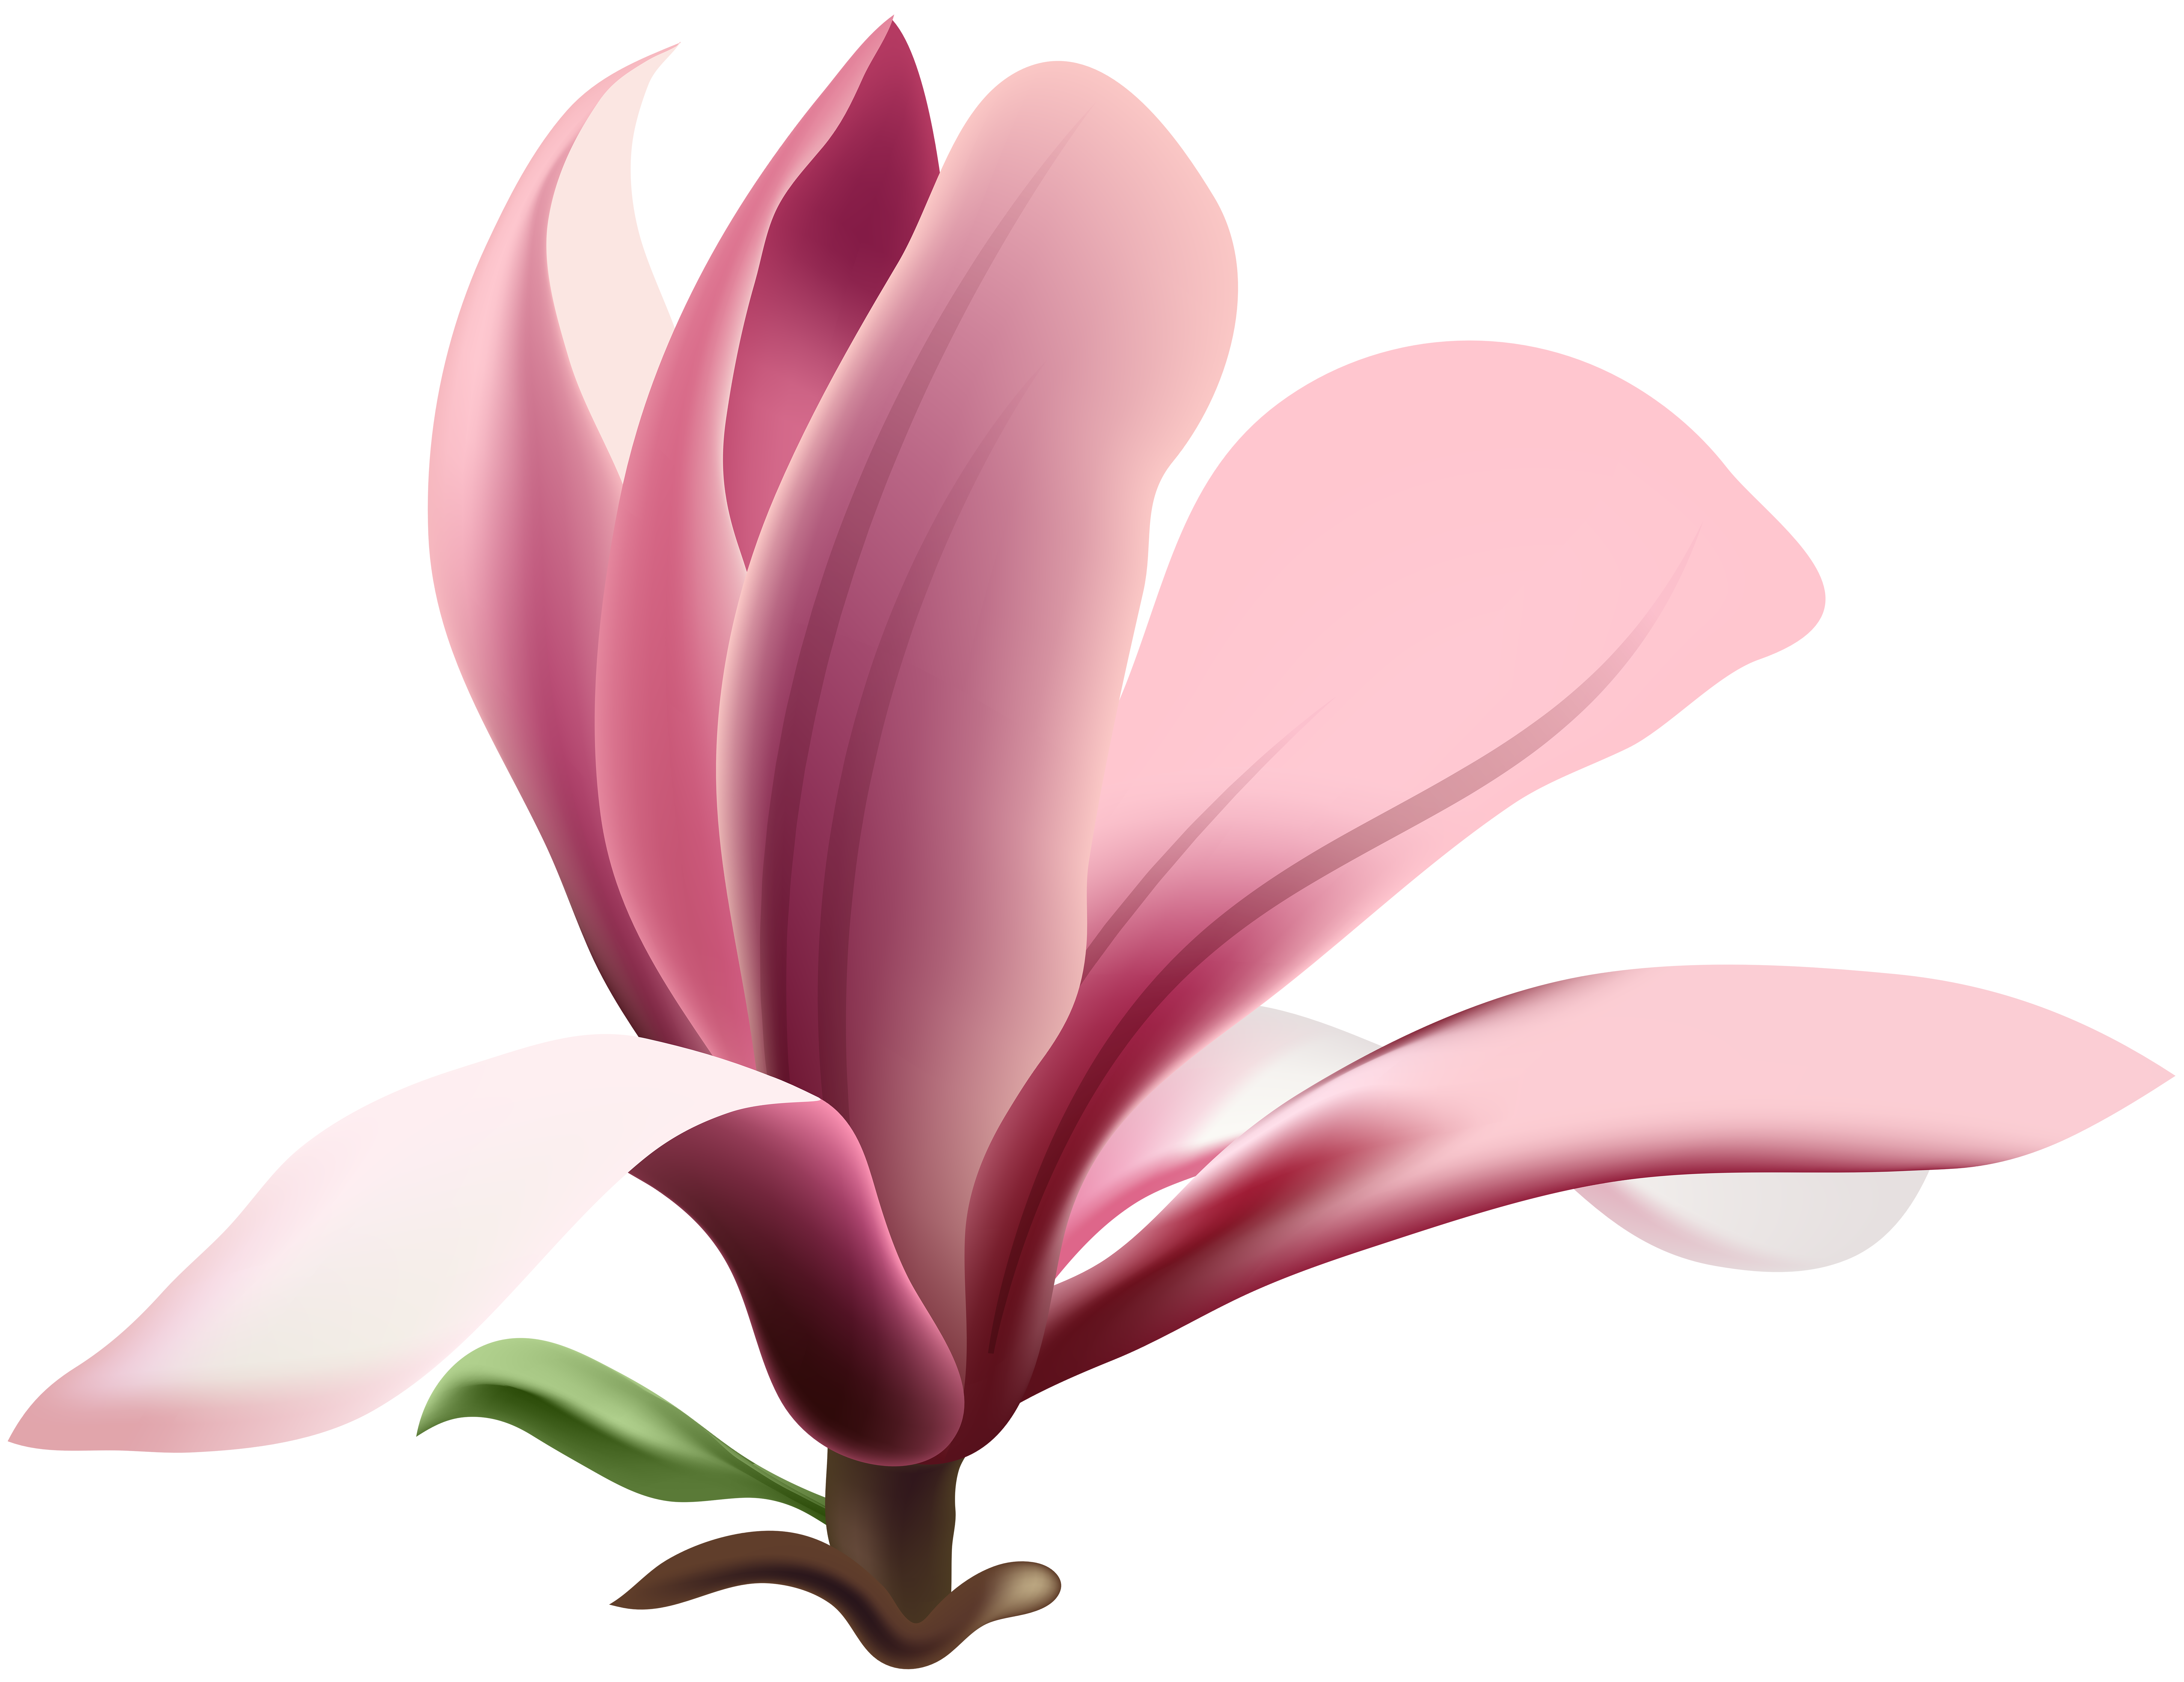 Magnolia Transparent PNG Clip Art Image.